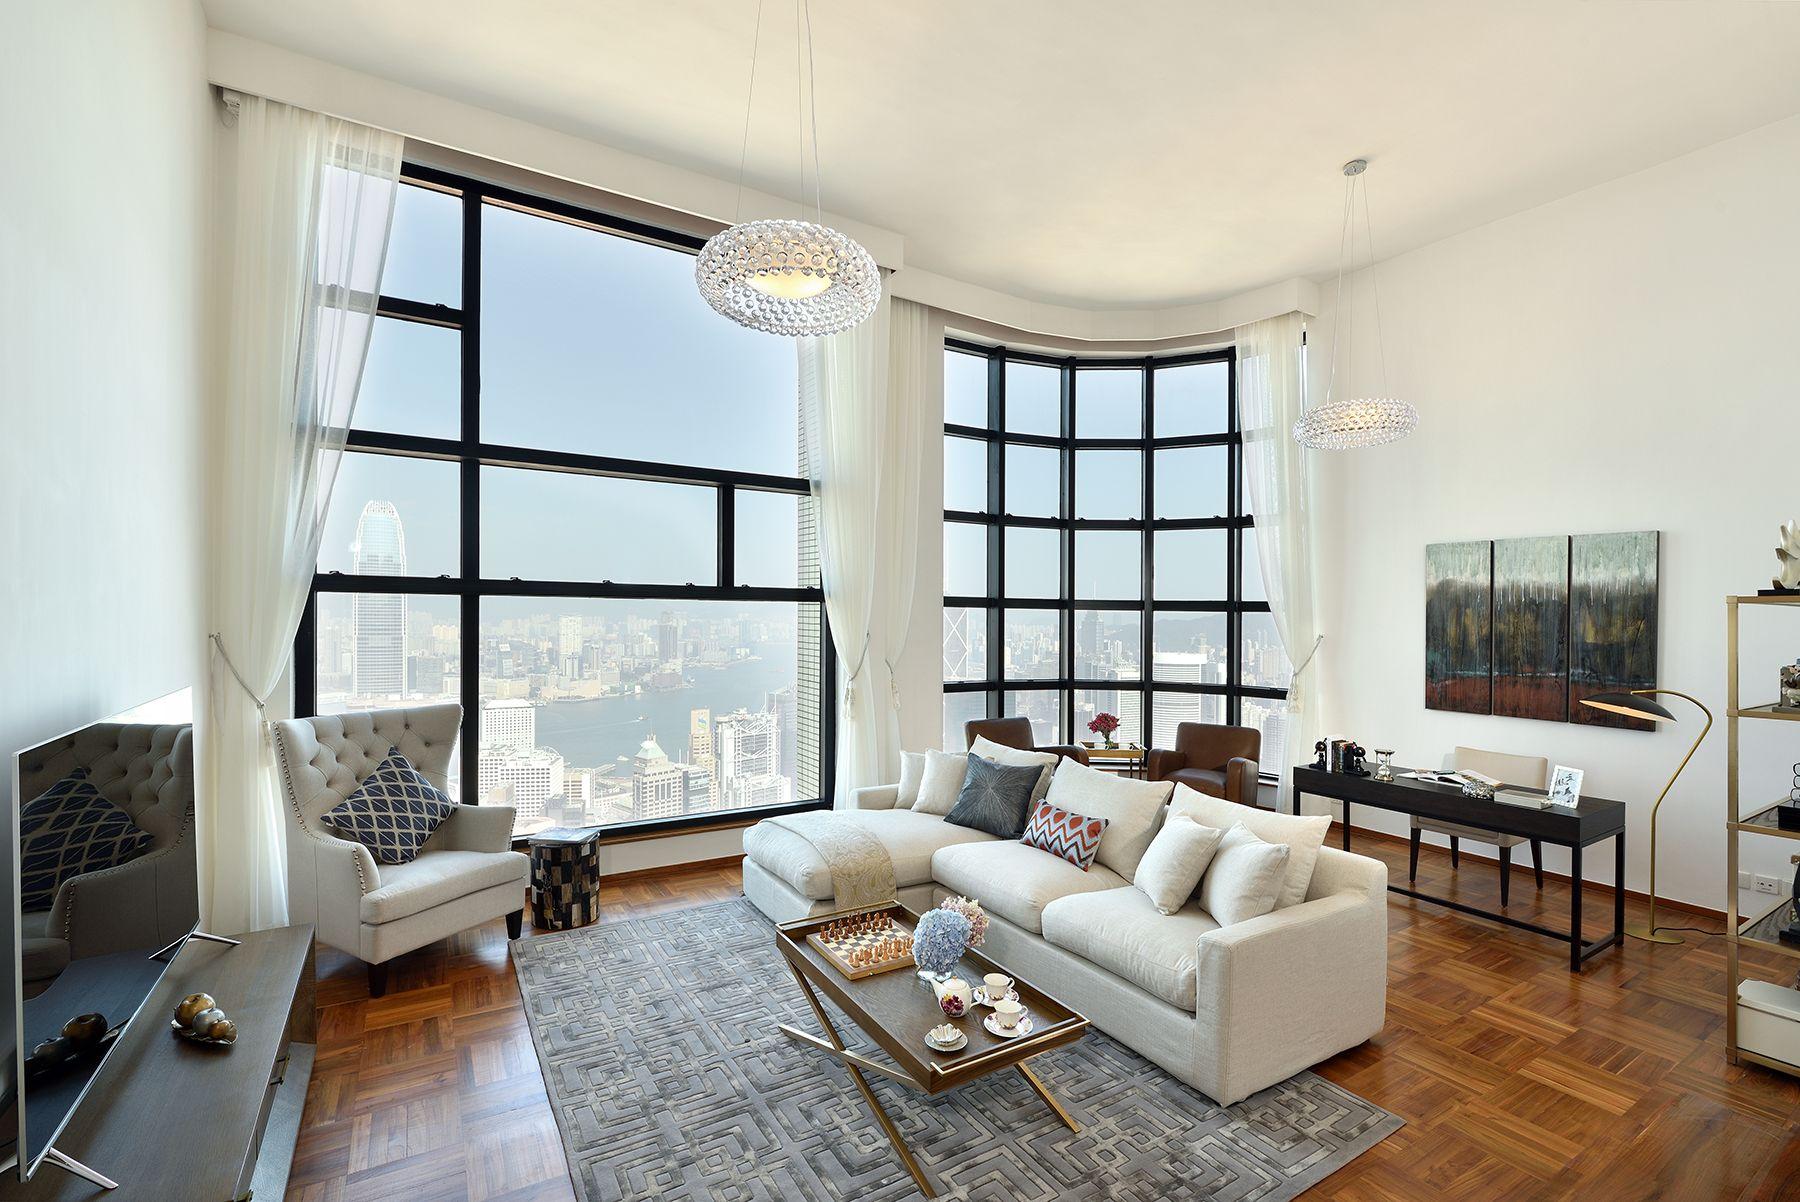 Discover Spacious Living at Queen's Garden Luxury Apartments